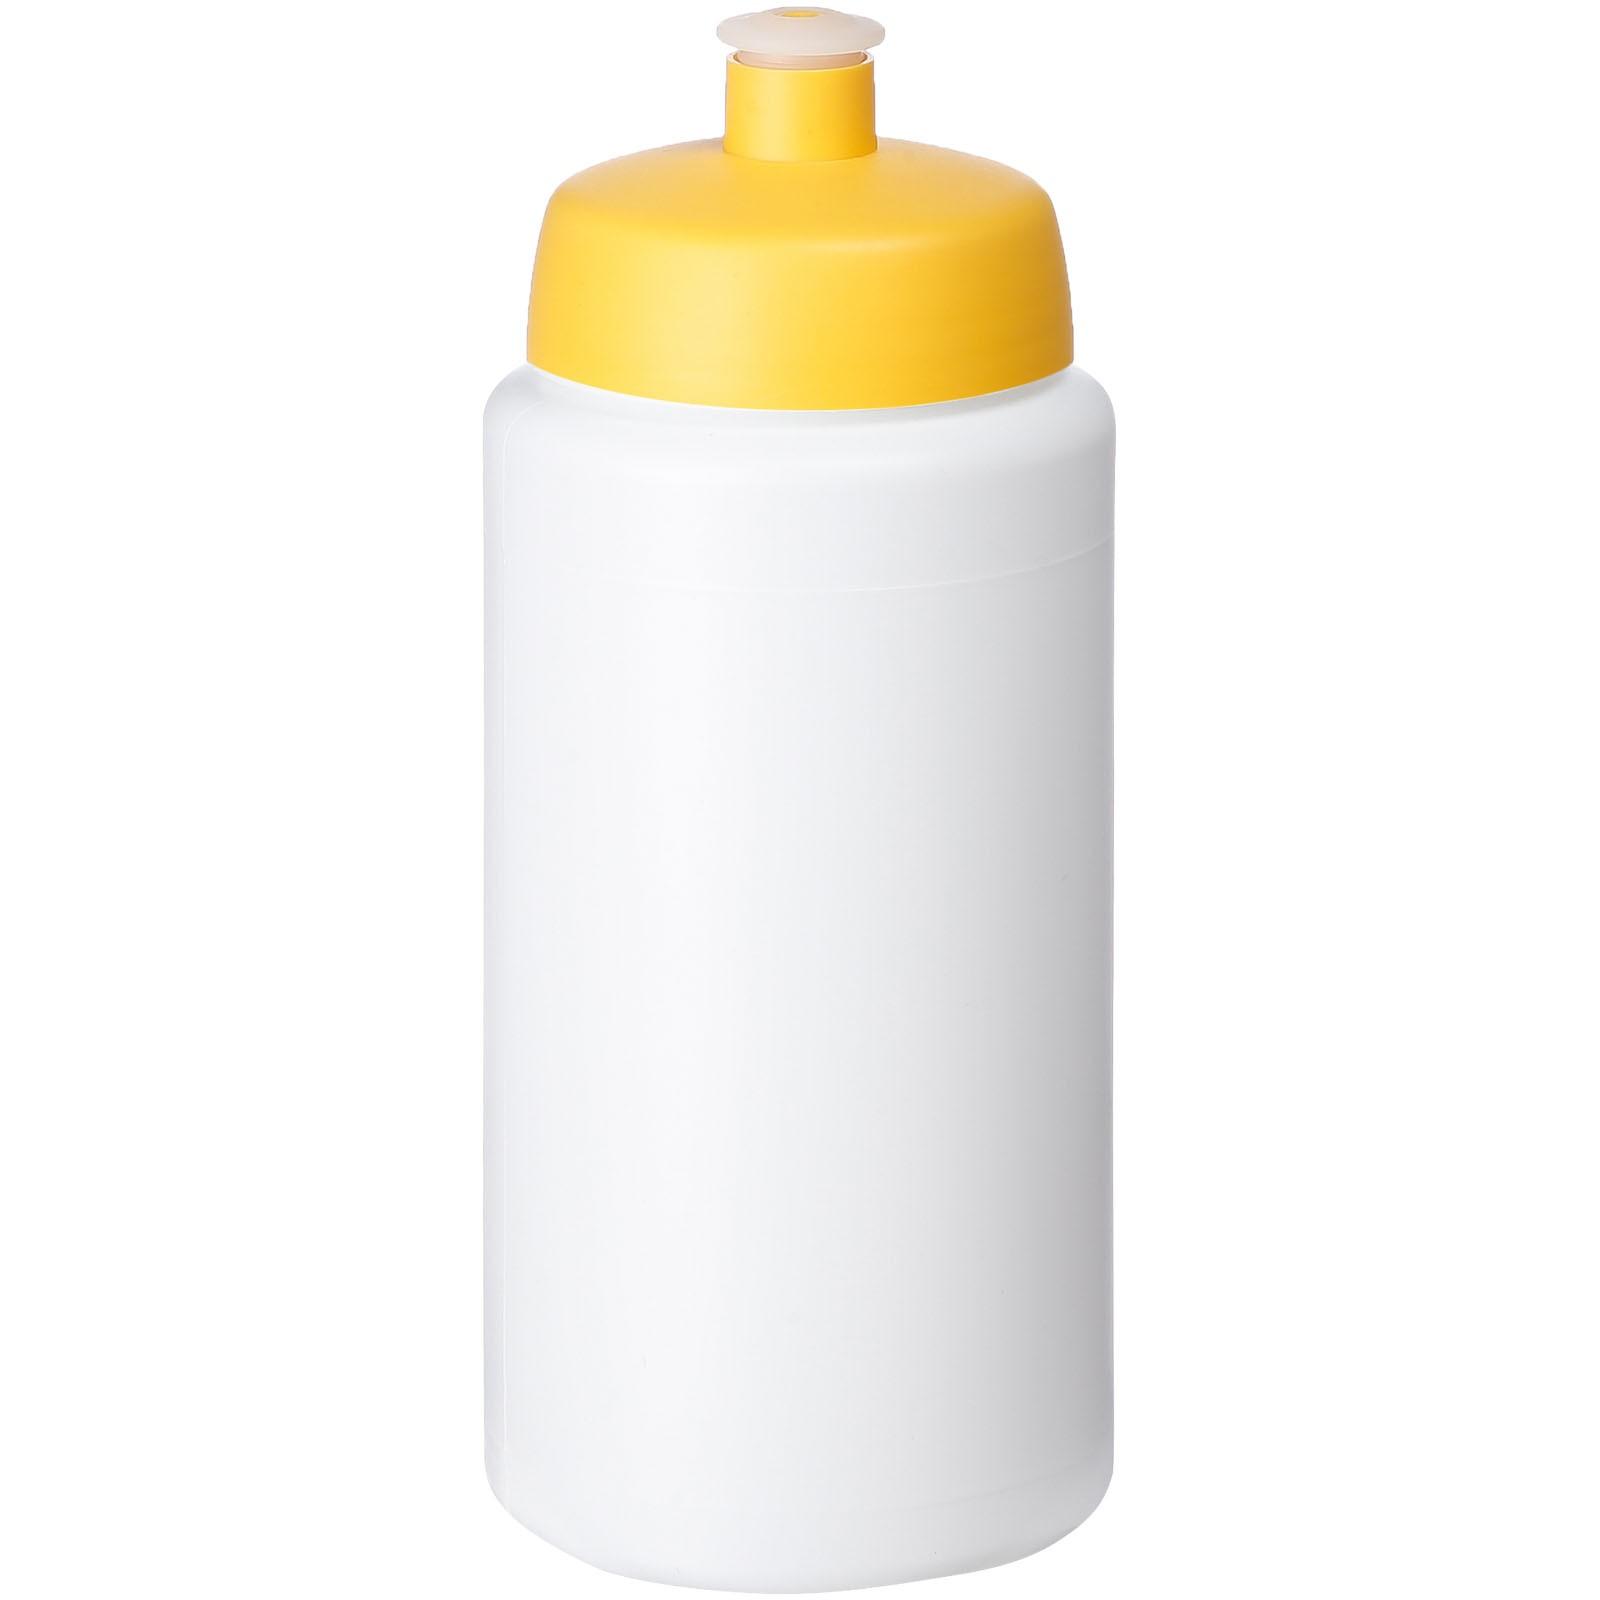 Baseline® Plus grip 500 ml sports lid sport bottle - White / Yellow